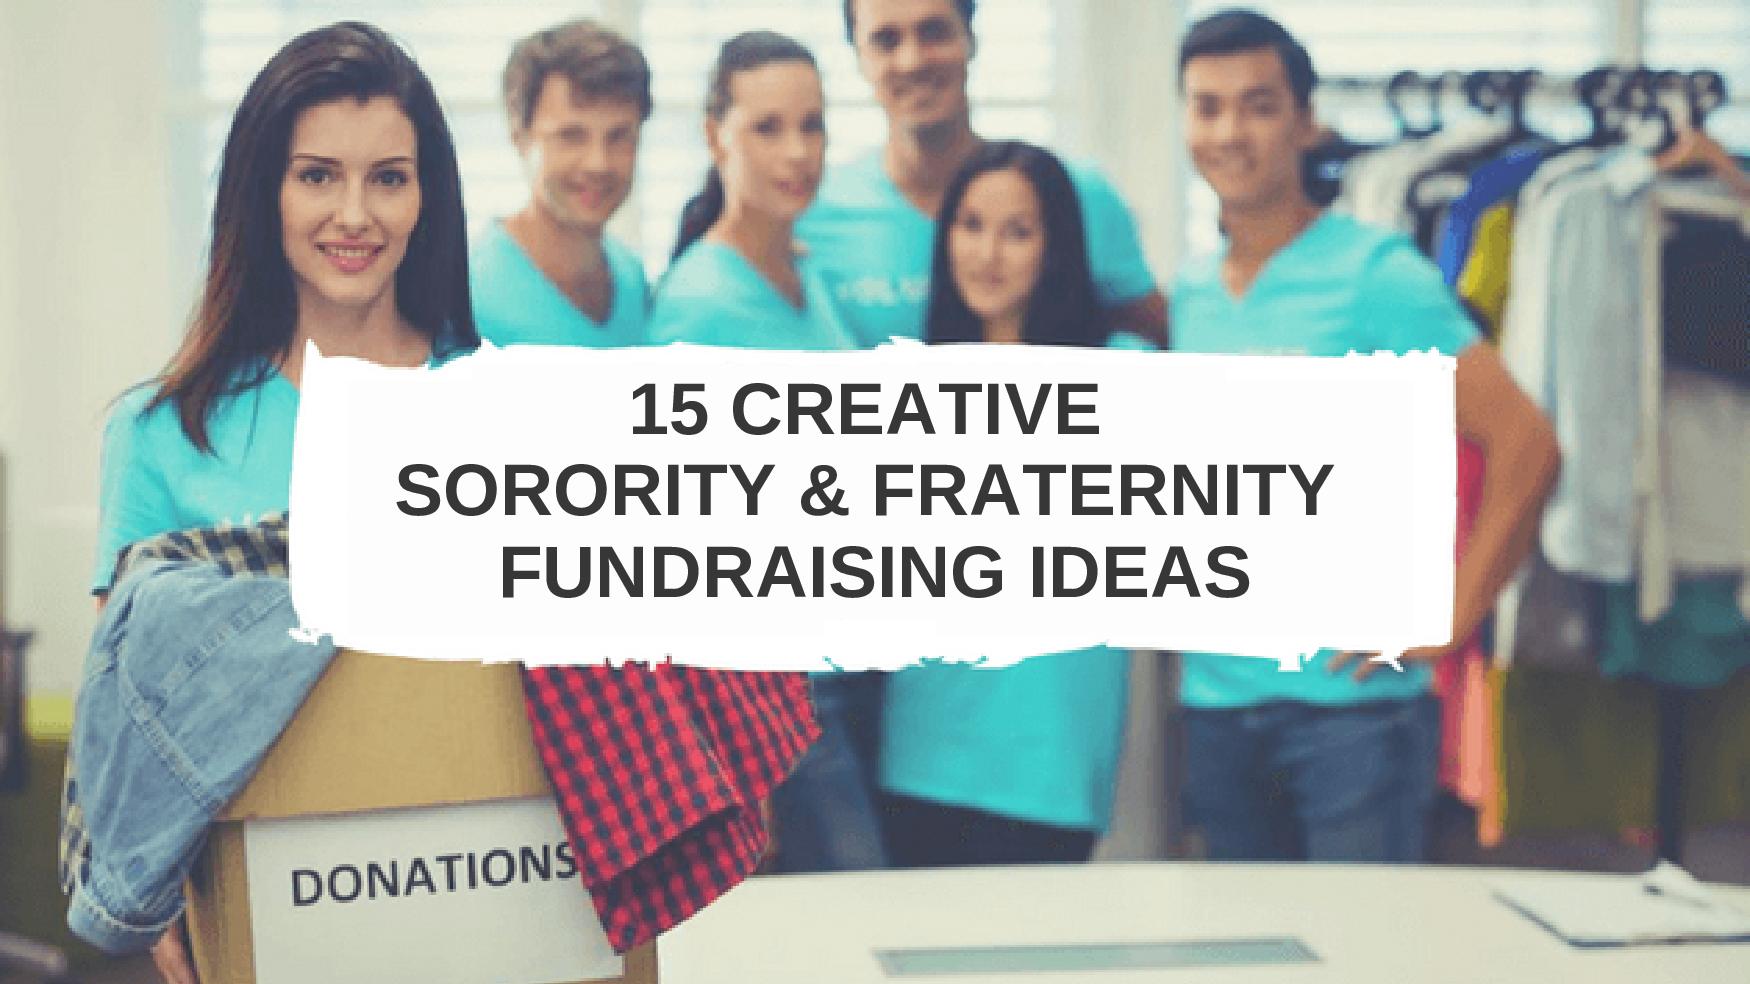 Fraternity Fundraising Ideas